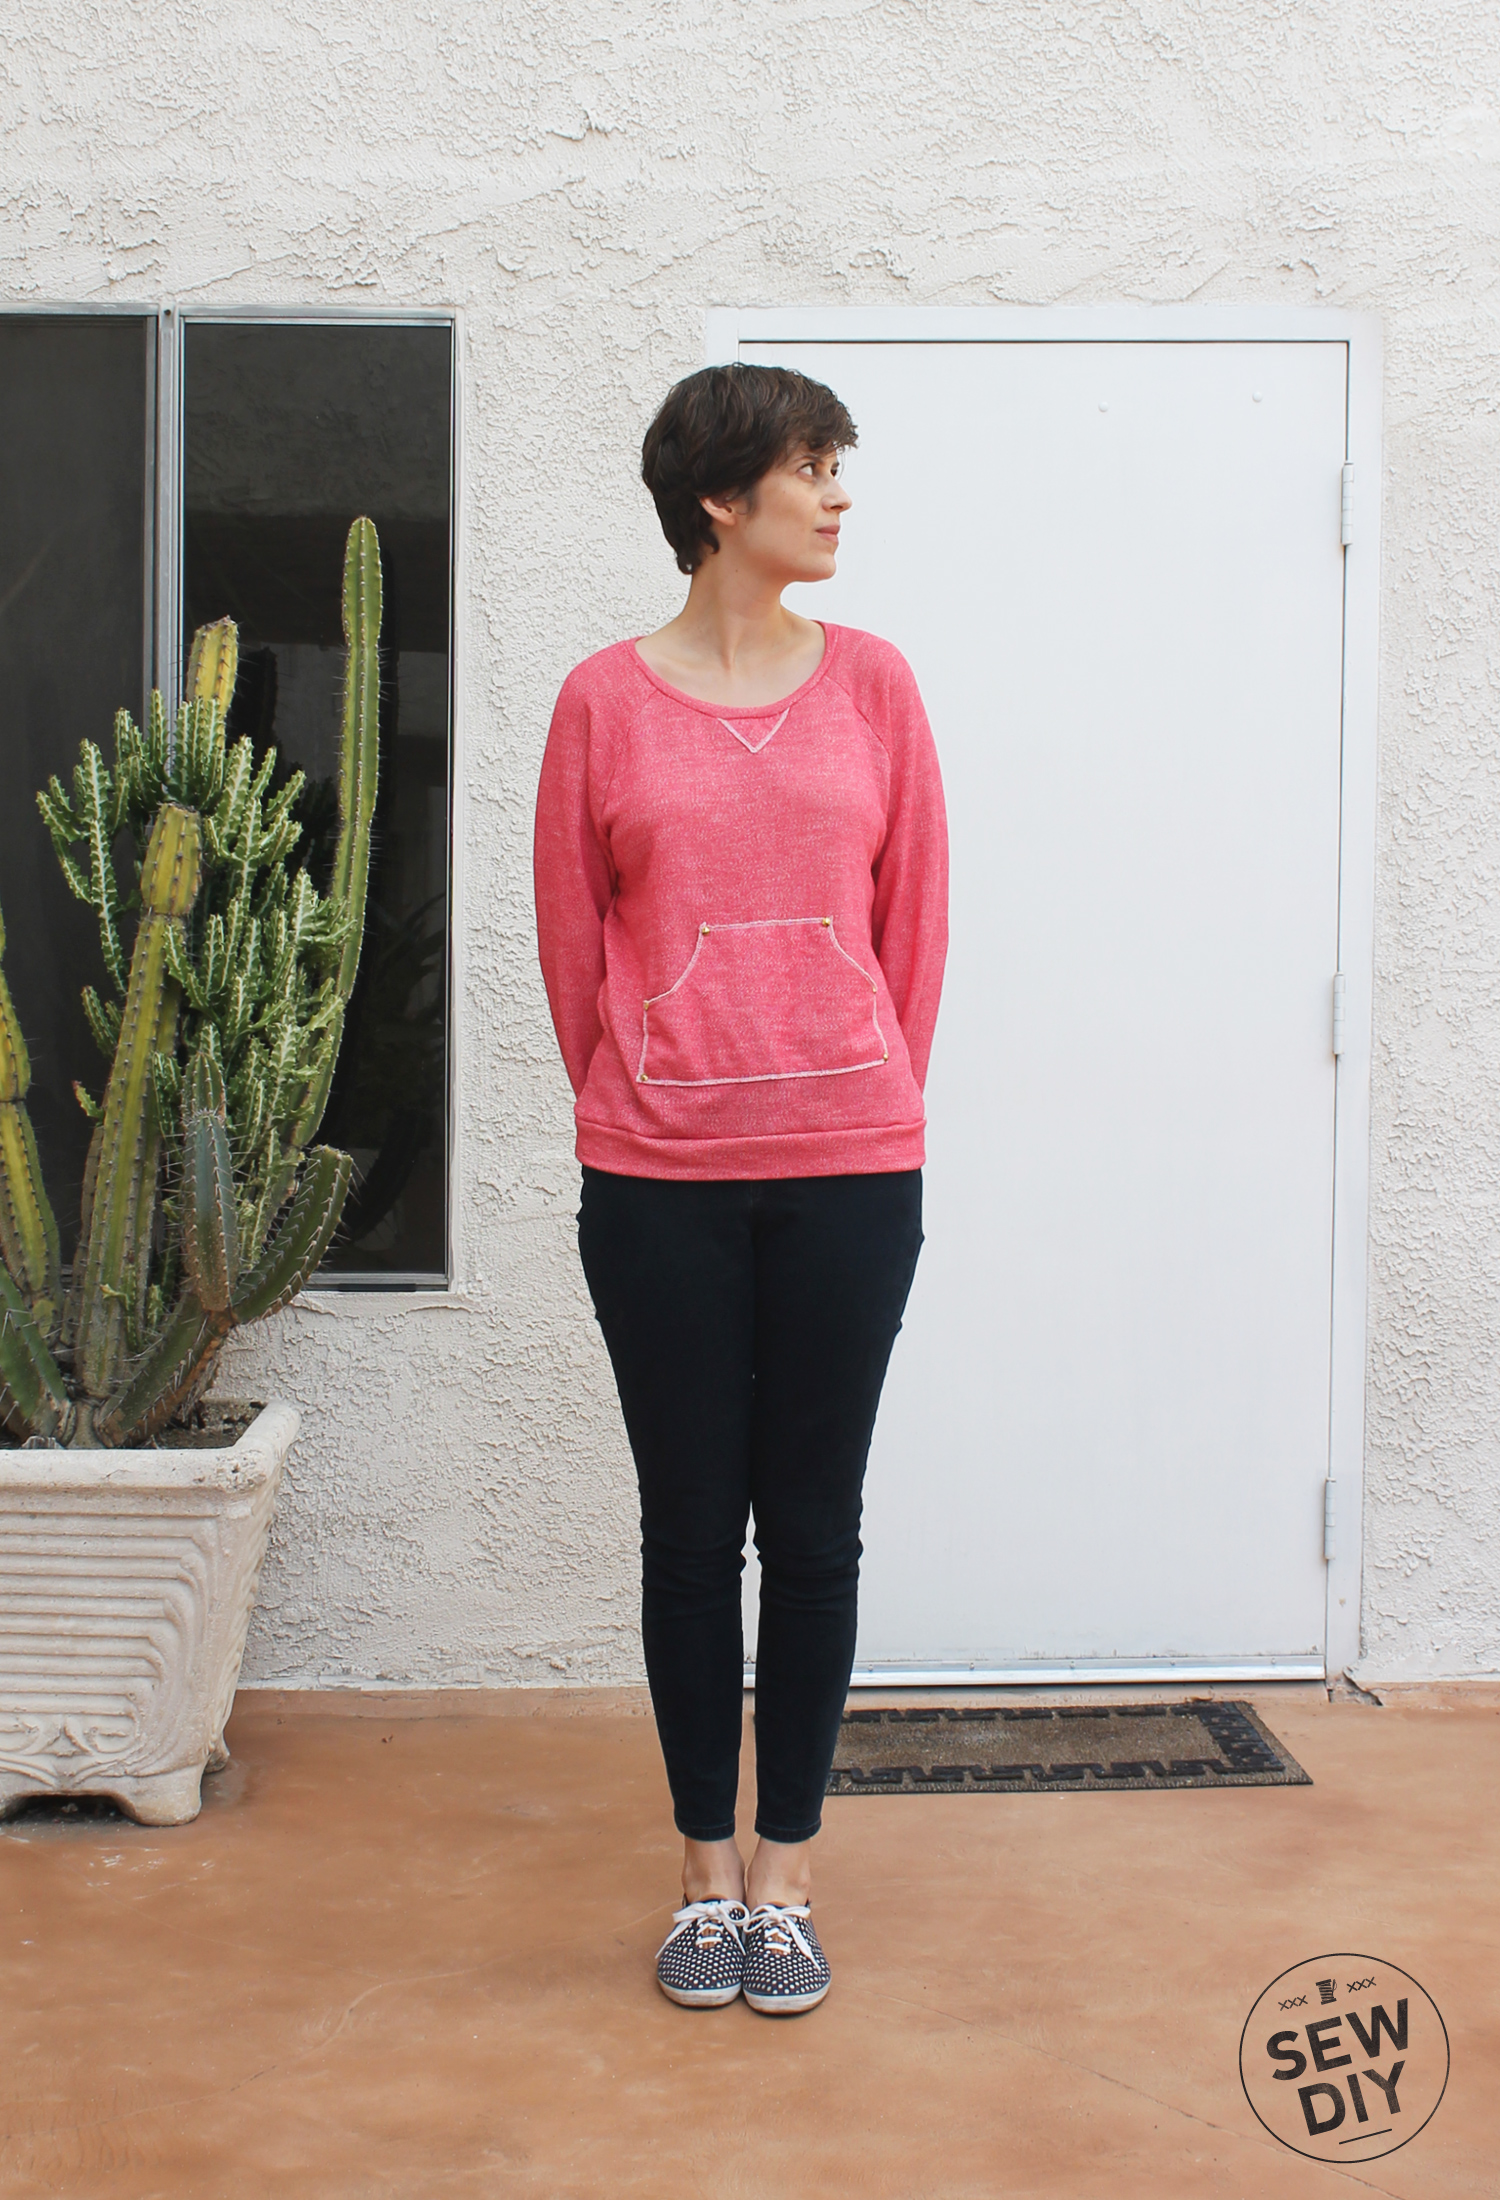 DIY Kangaroo Pocket Linden Sweatshirt – Sew DIY